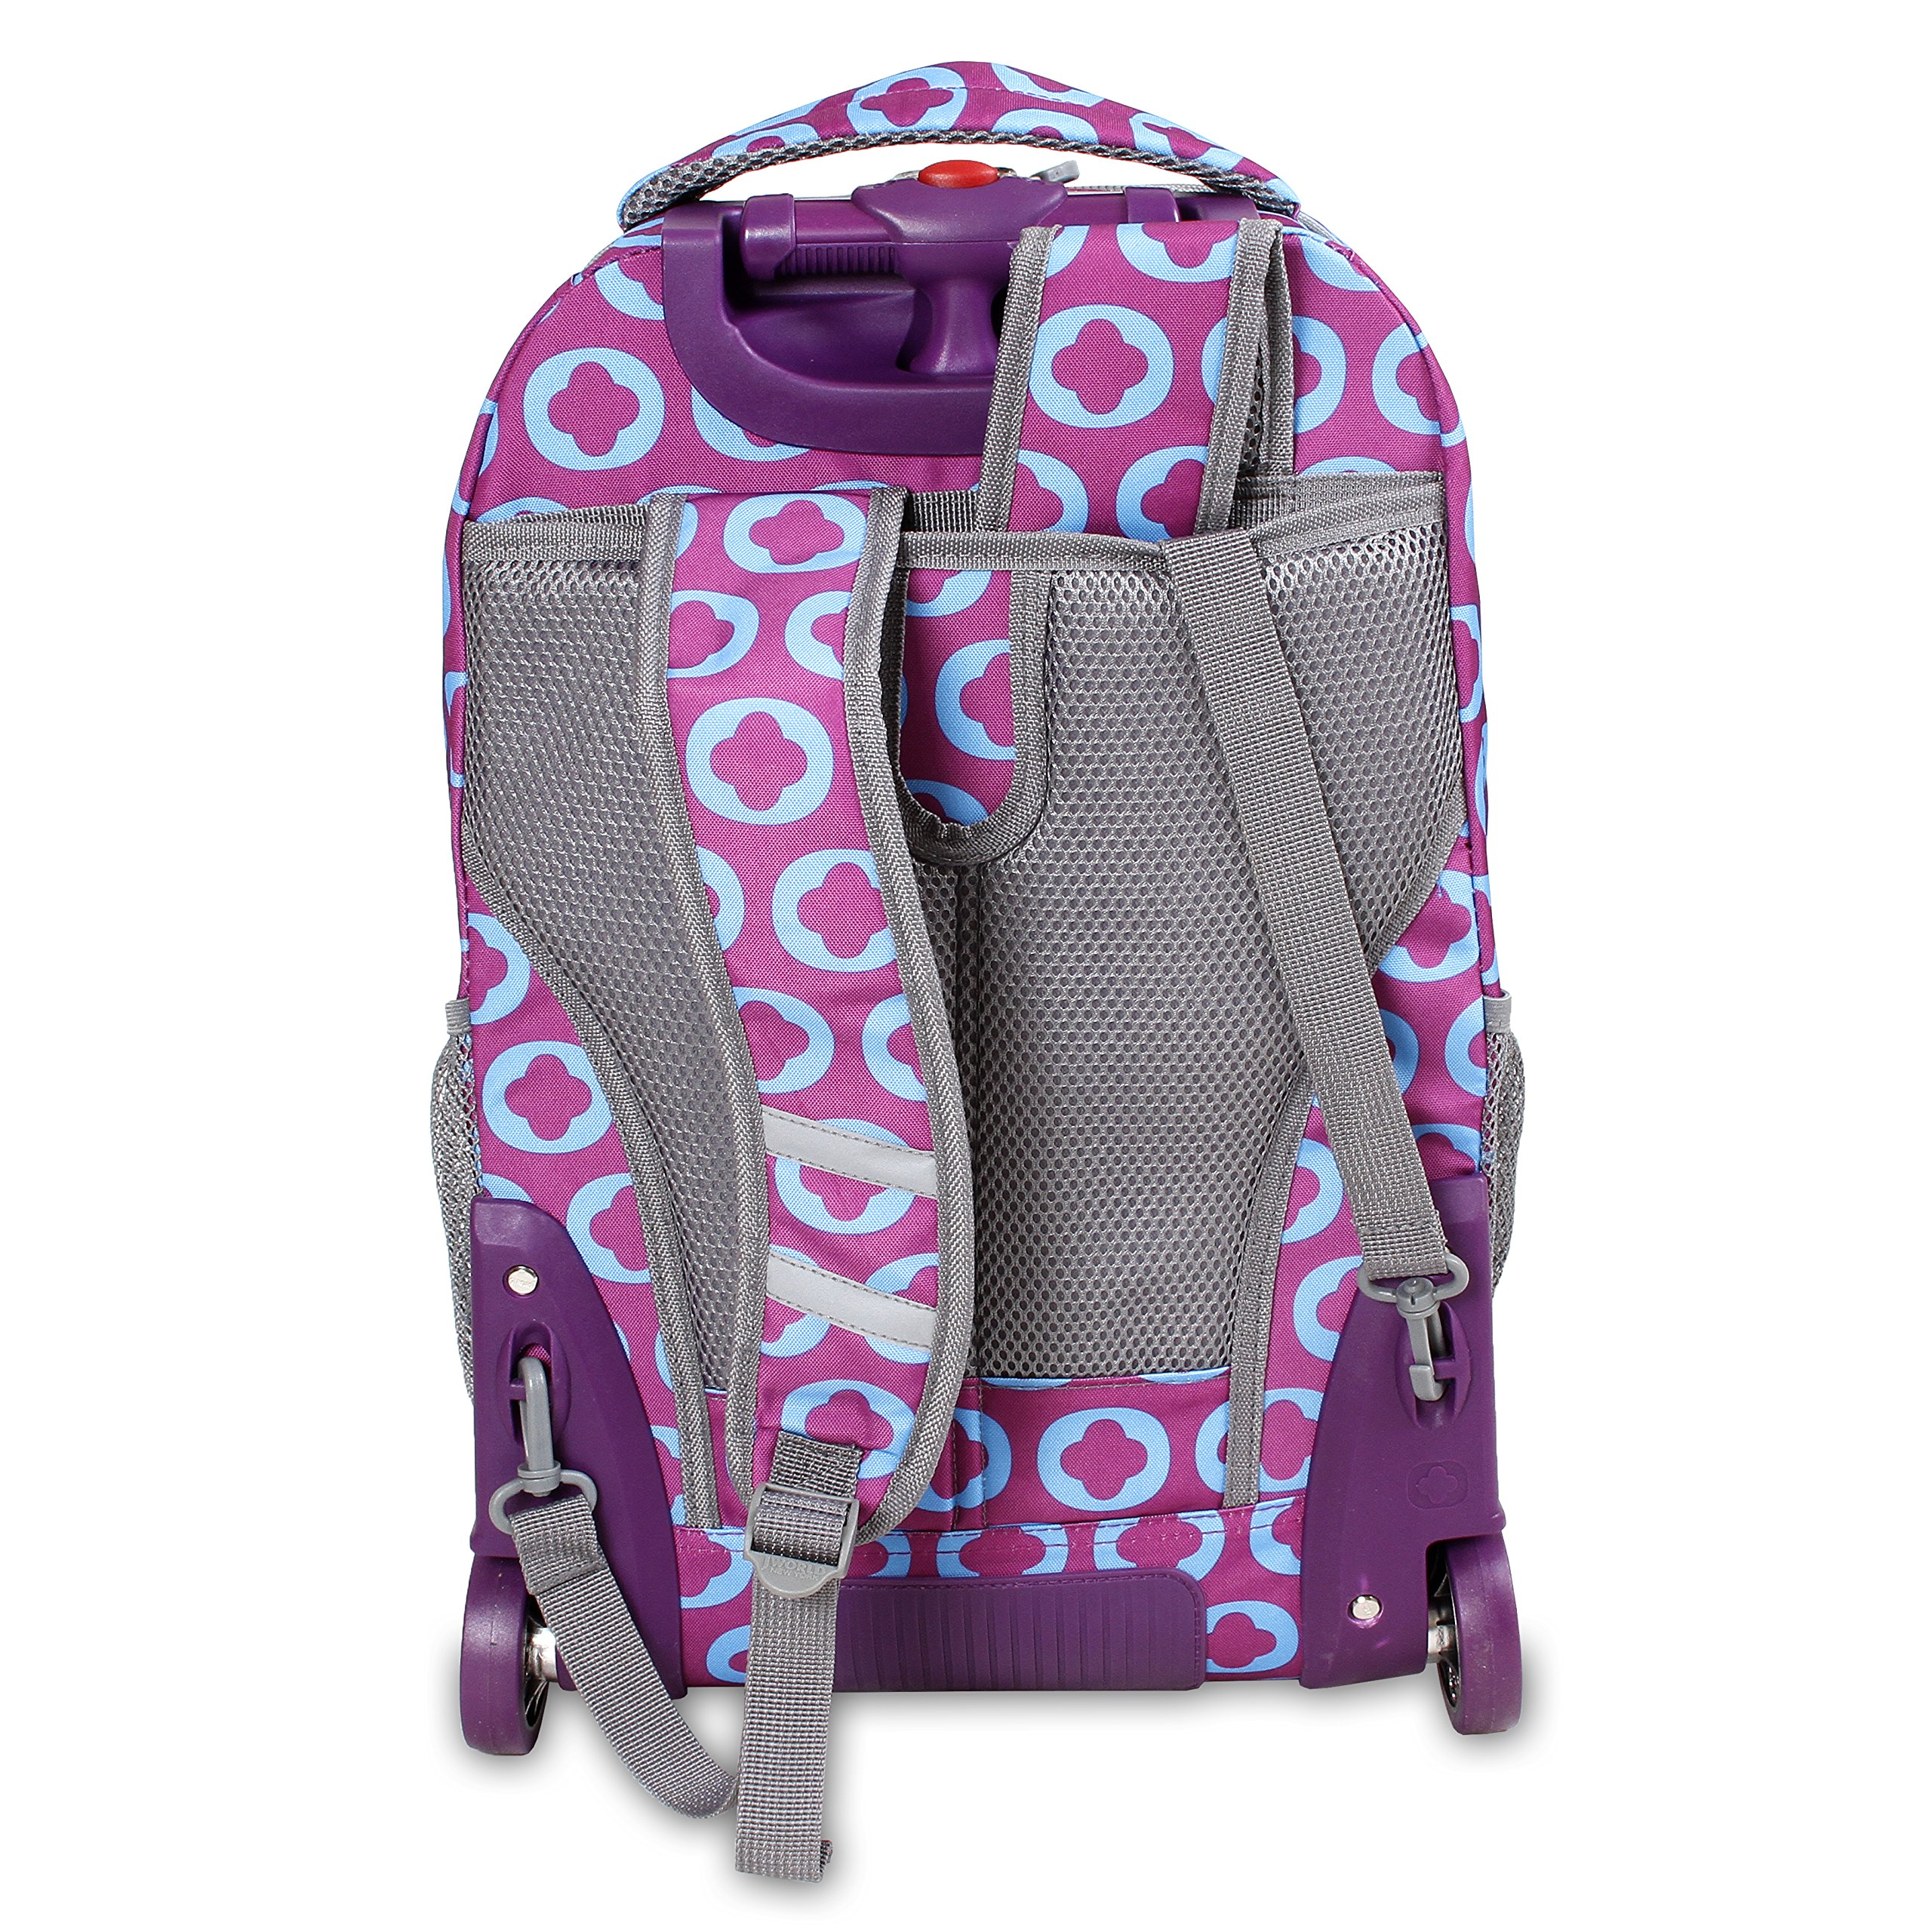 2724d26e1 J World New York Sunny Rolling Backpack | Building Materials Bargain ...